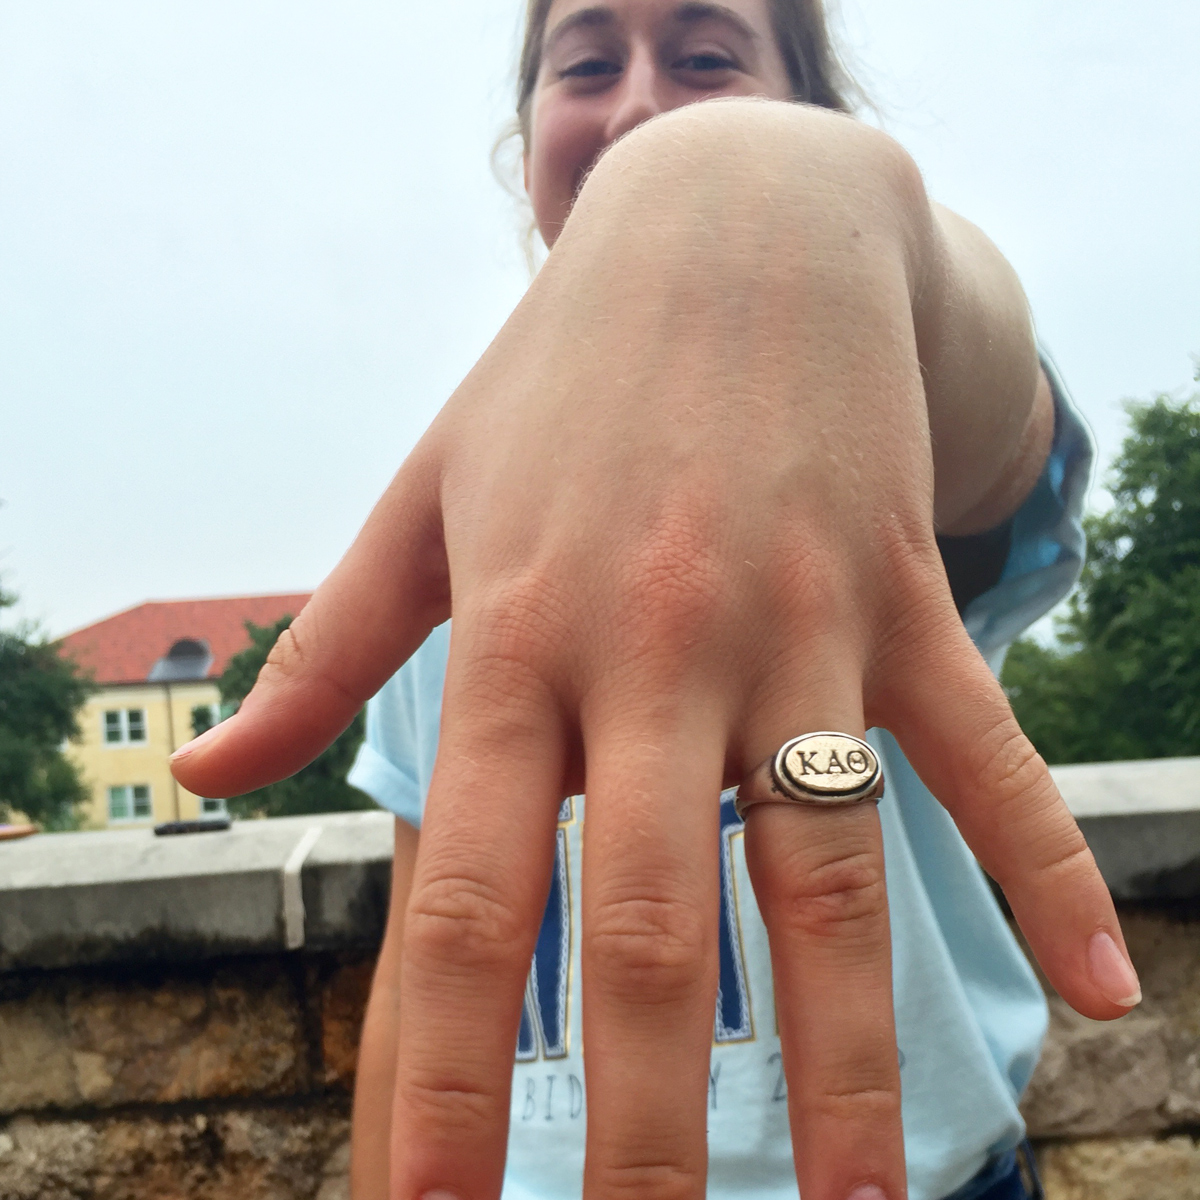 monogram sorority ring